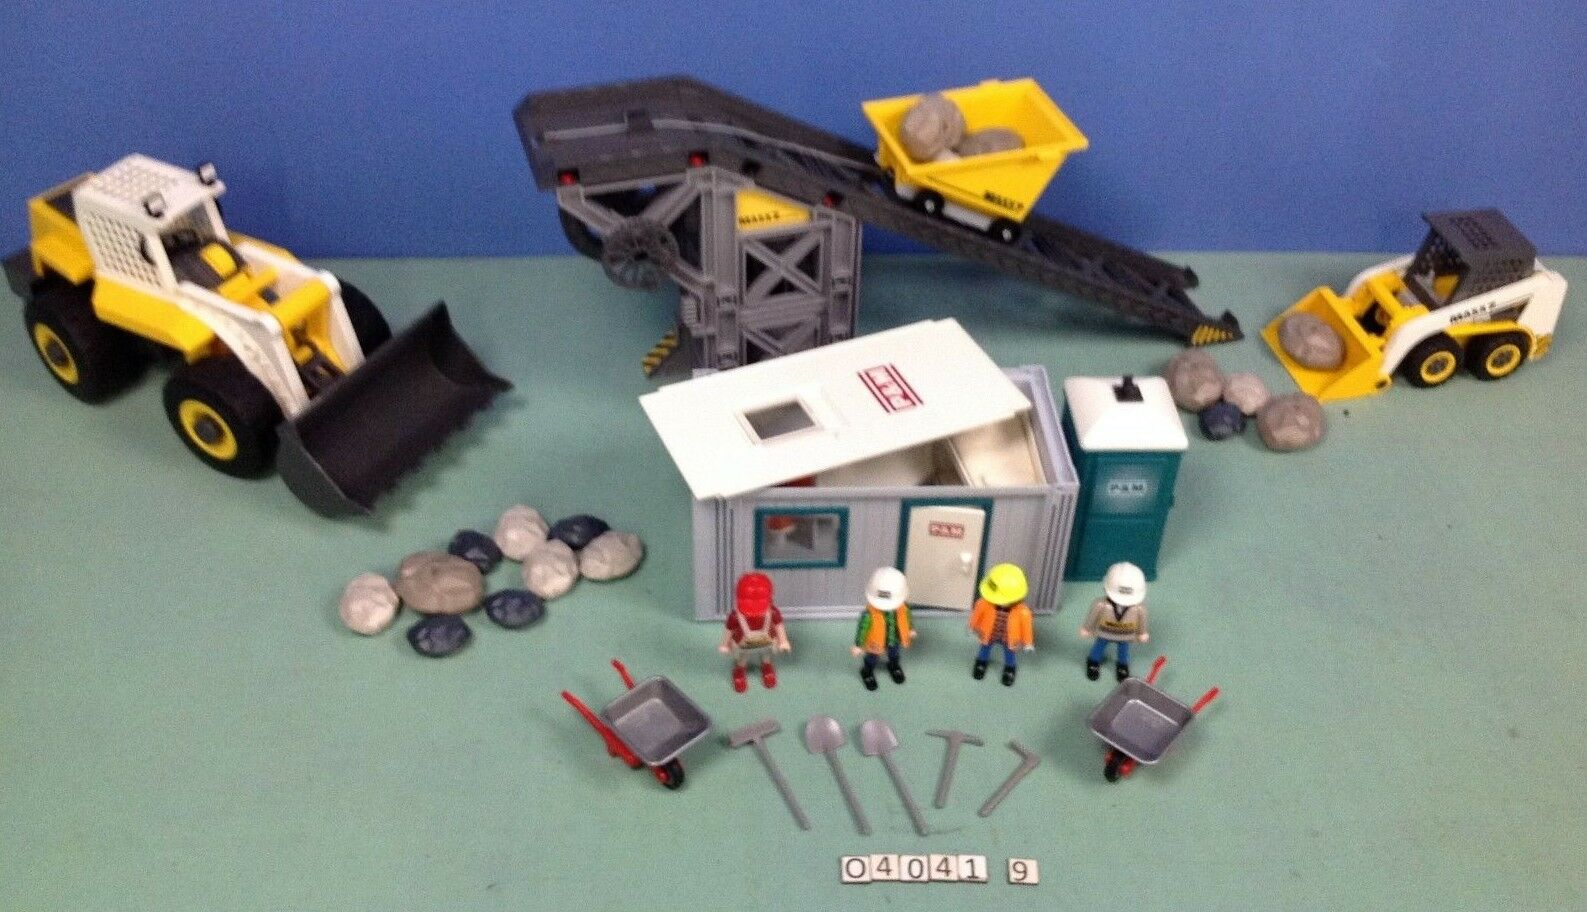 (O4041.9) playmobil convoyeur avec pelleteuse maxx7 ref 4041 + 4038  + 3260 +3275  punto vendita